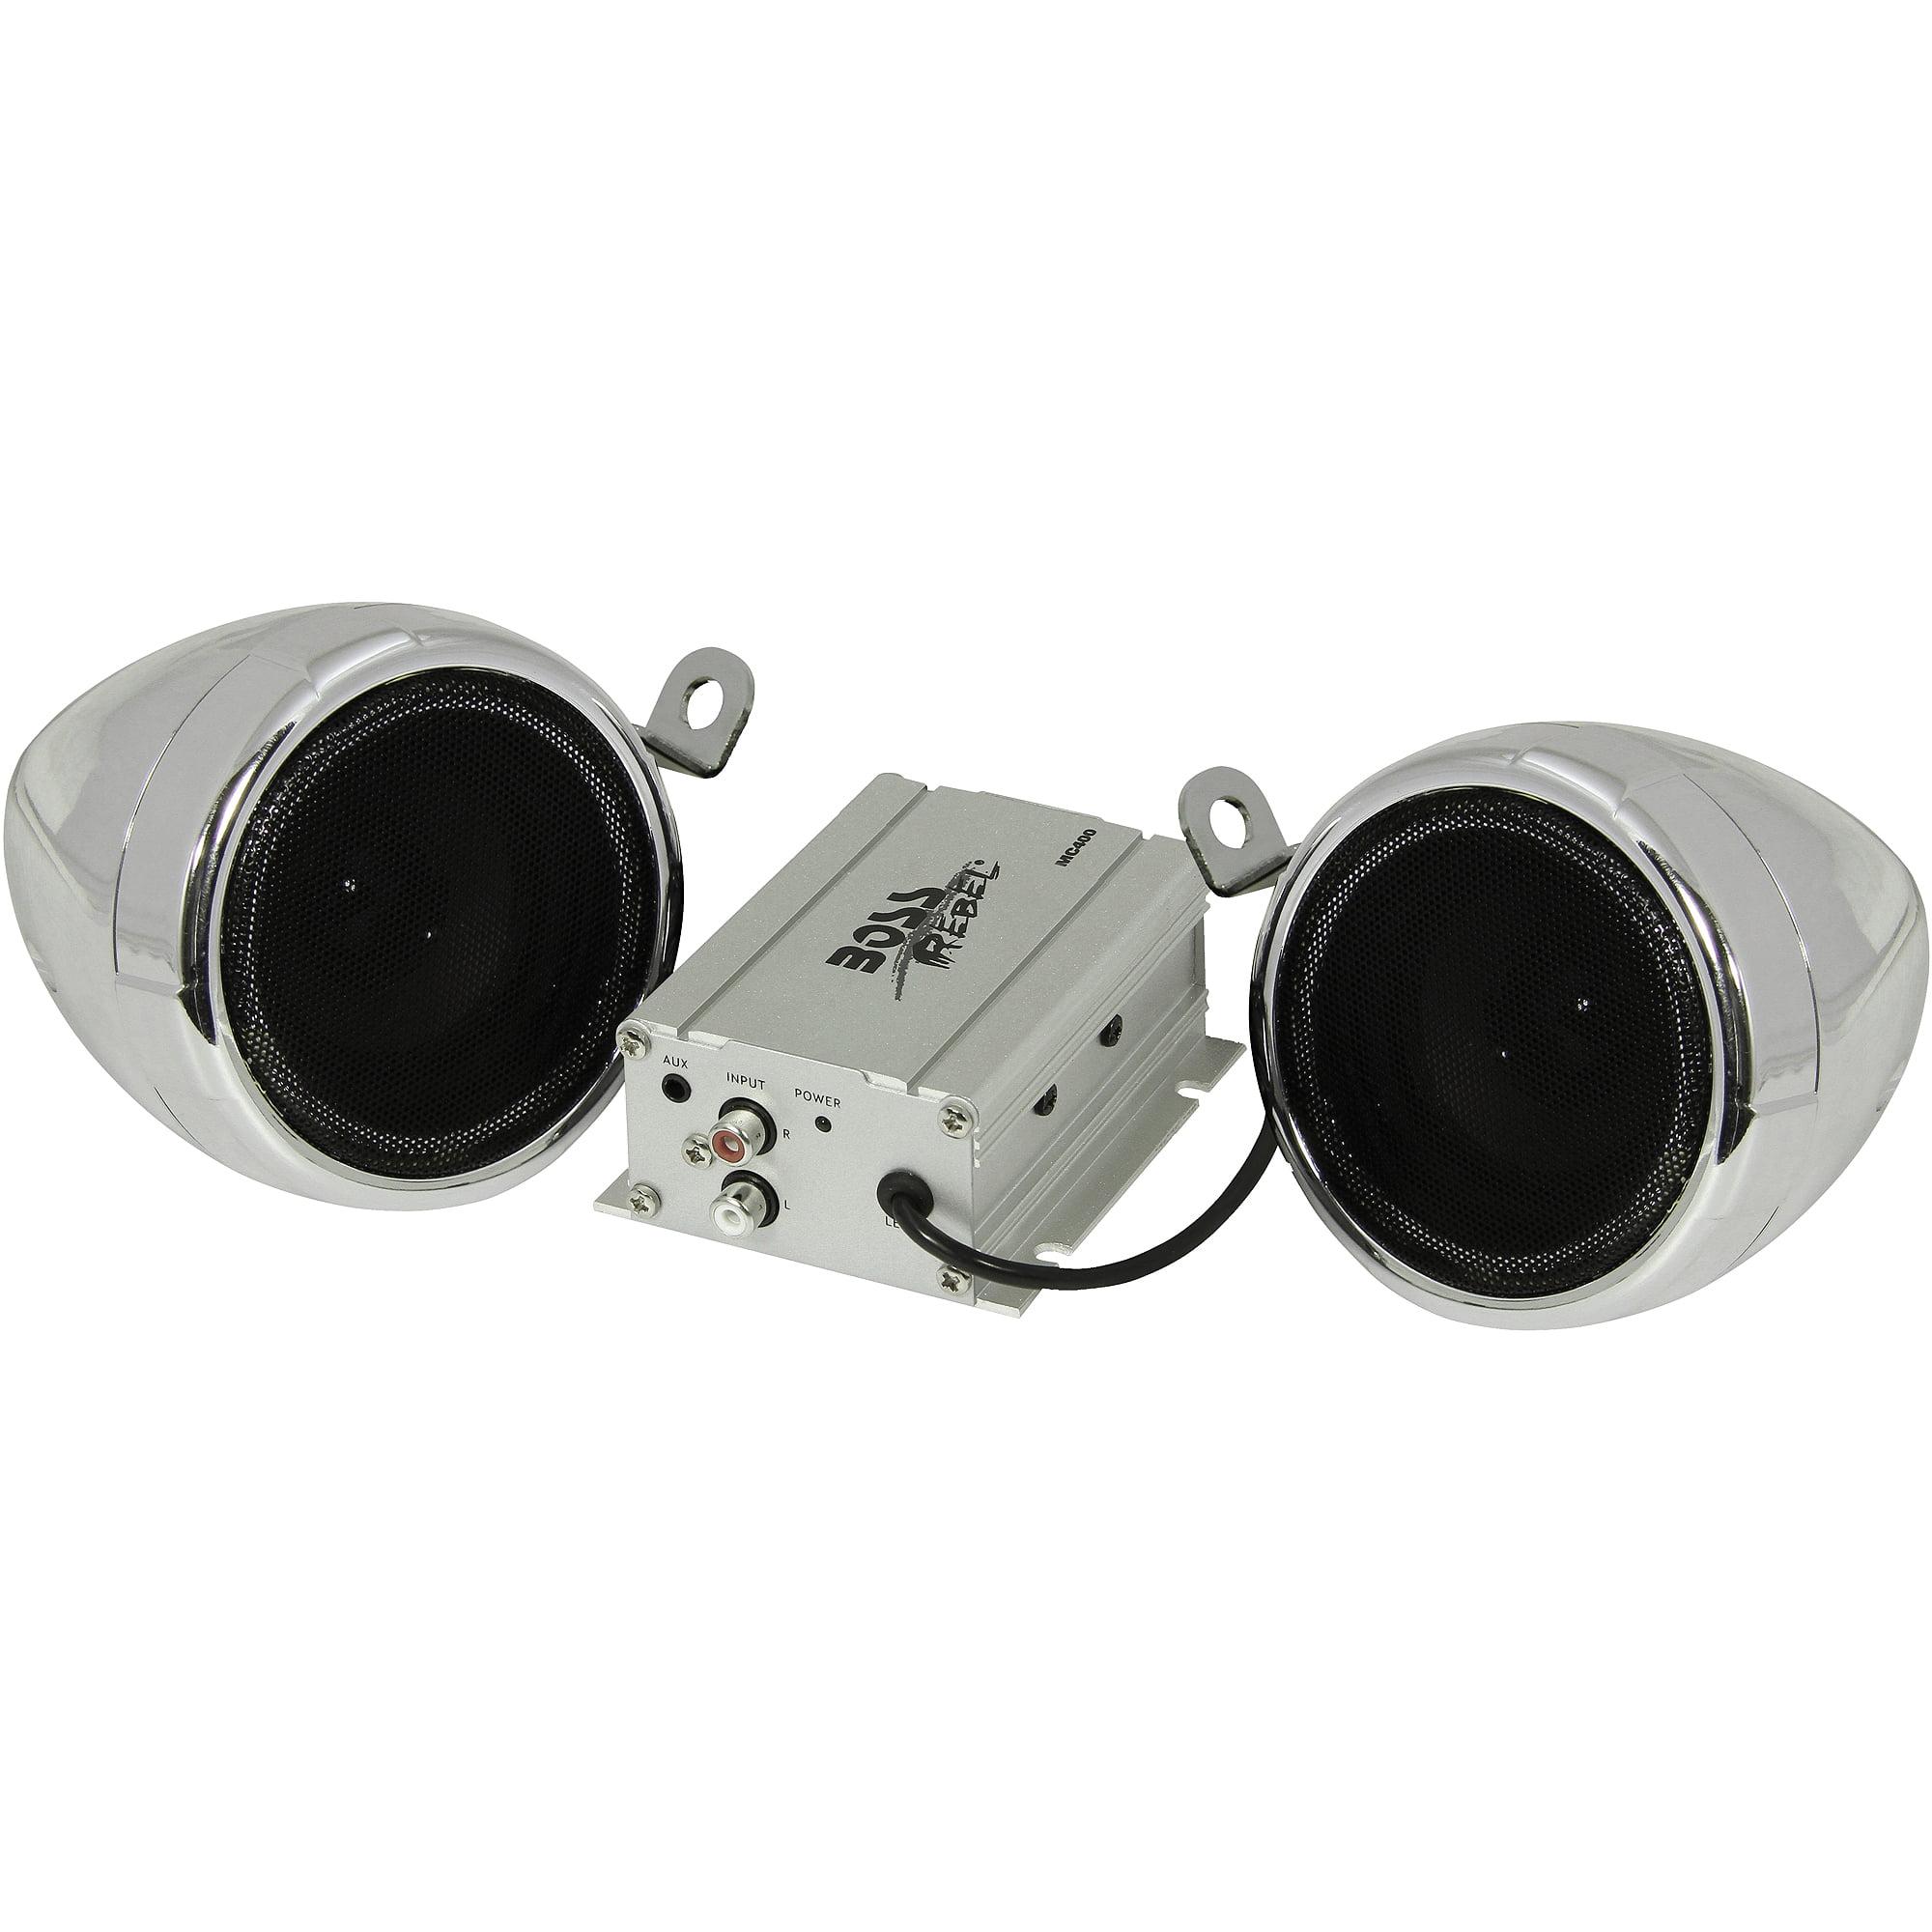 "Boss Audio MC400 Amplified 3.0"" Weatherproof ATV Speakers"